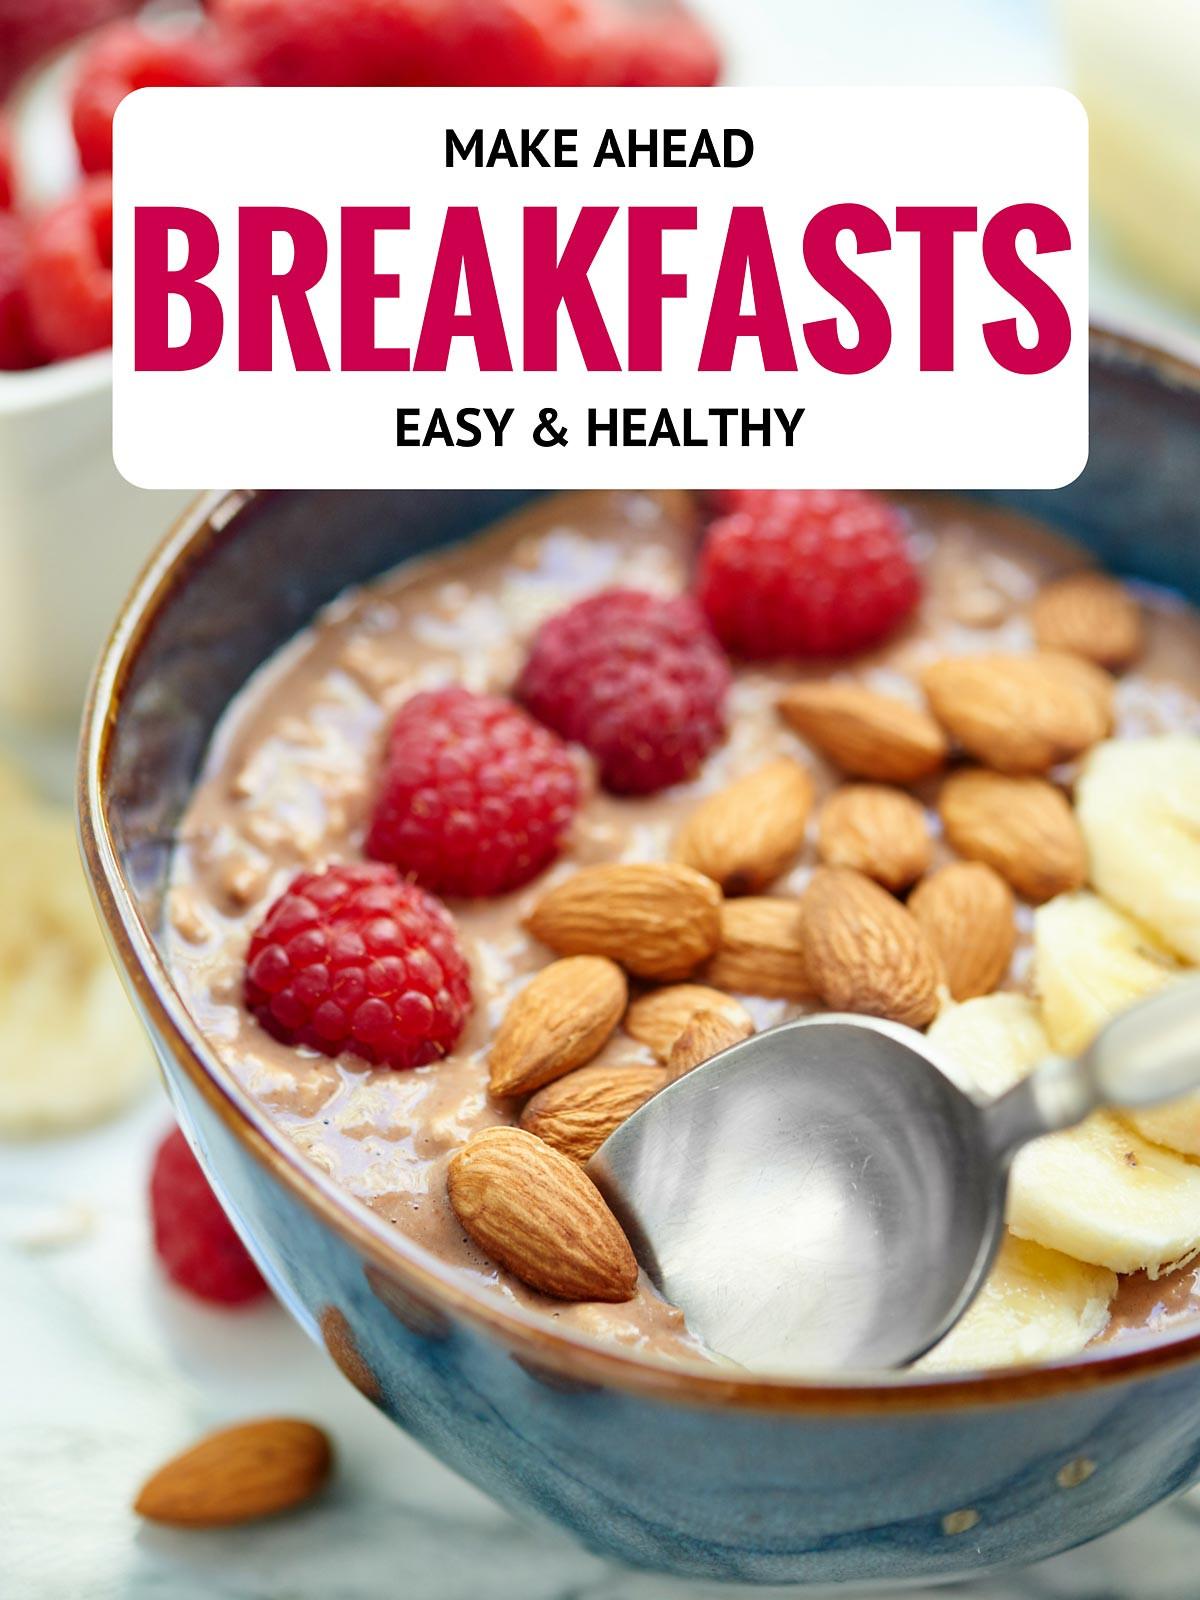 Yummy Breakfast Recipes  Easy Healthy Make Ahead Breakfast Recipes Show Me the Yummy